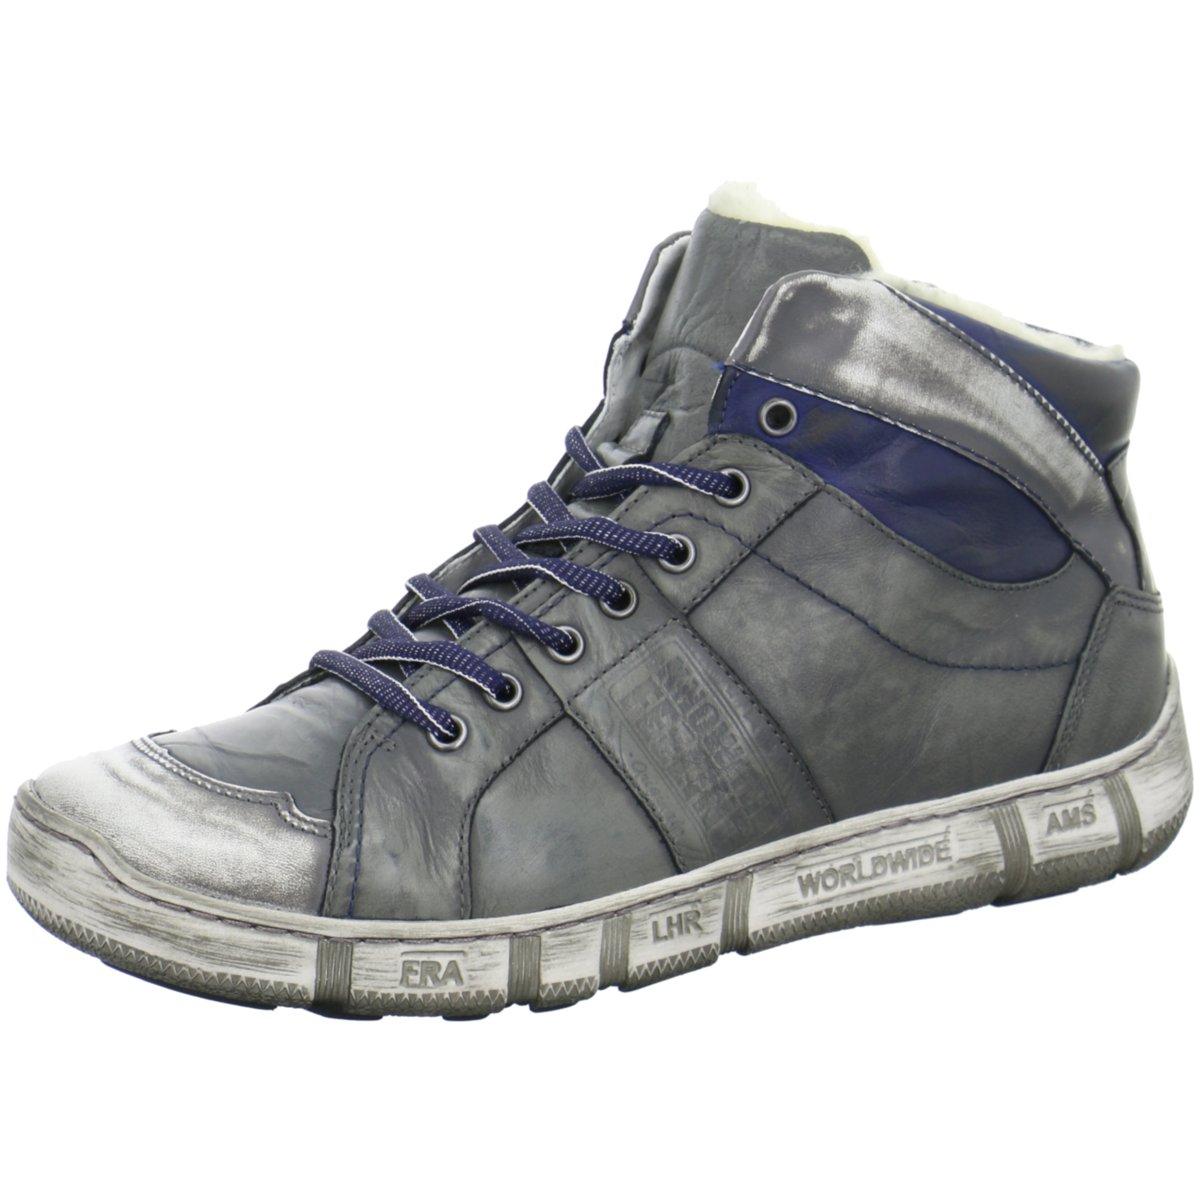 NEU Kacper Herren Sneaker Herren Winter-Boots 3-4730-352+656+656+329-BSF grau